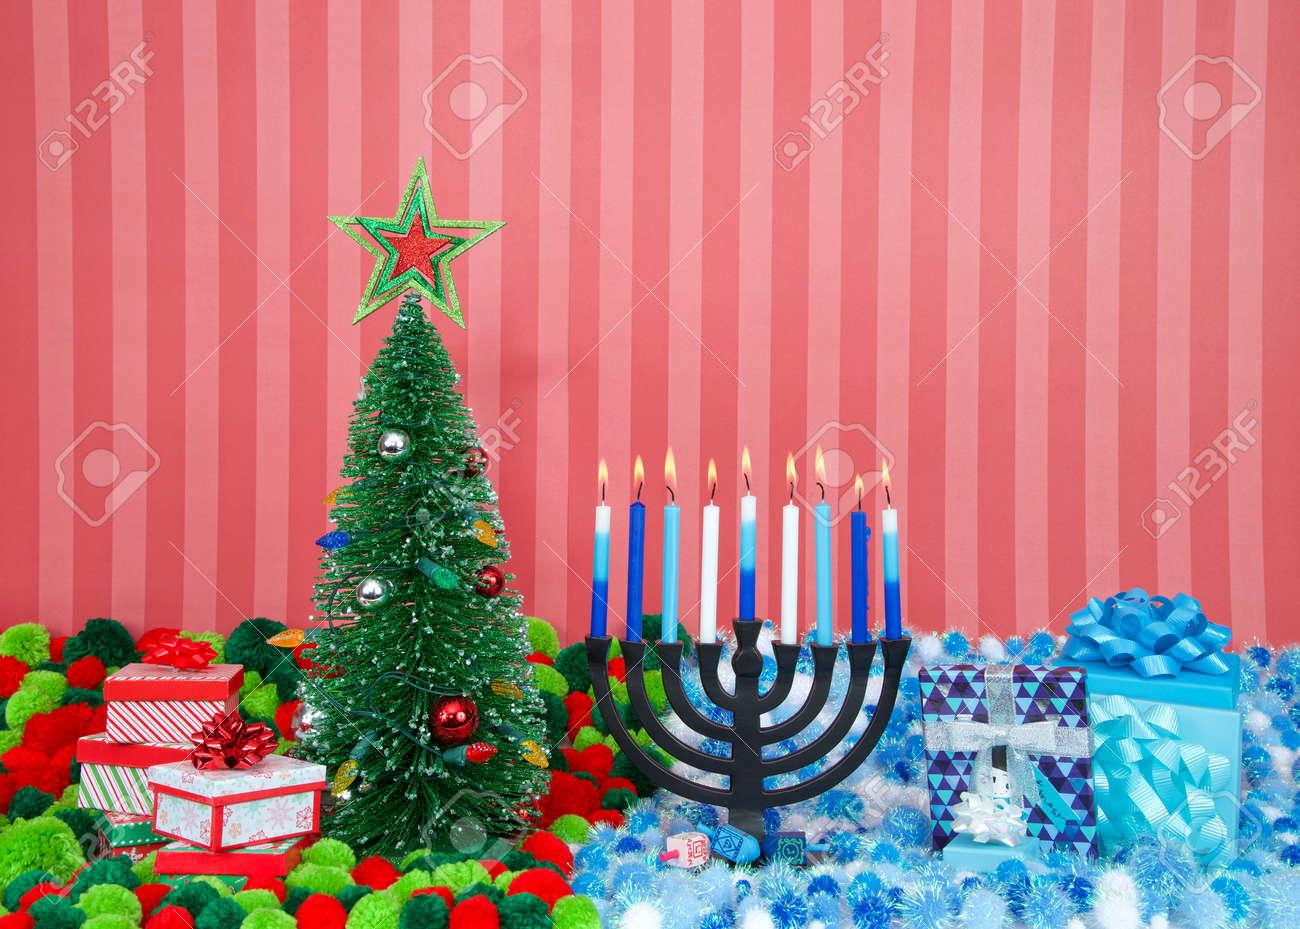 Christmas Hannakah.Christmas Tree With Presents Next To Hanukkah Menorah Burning